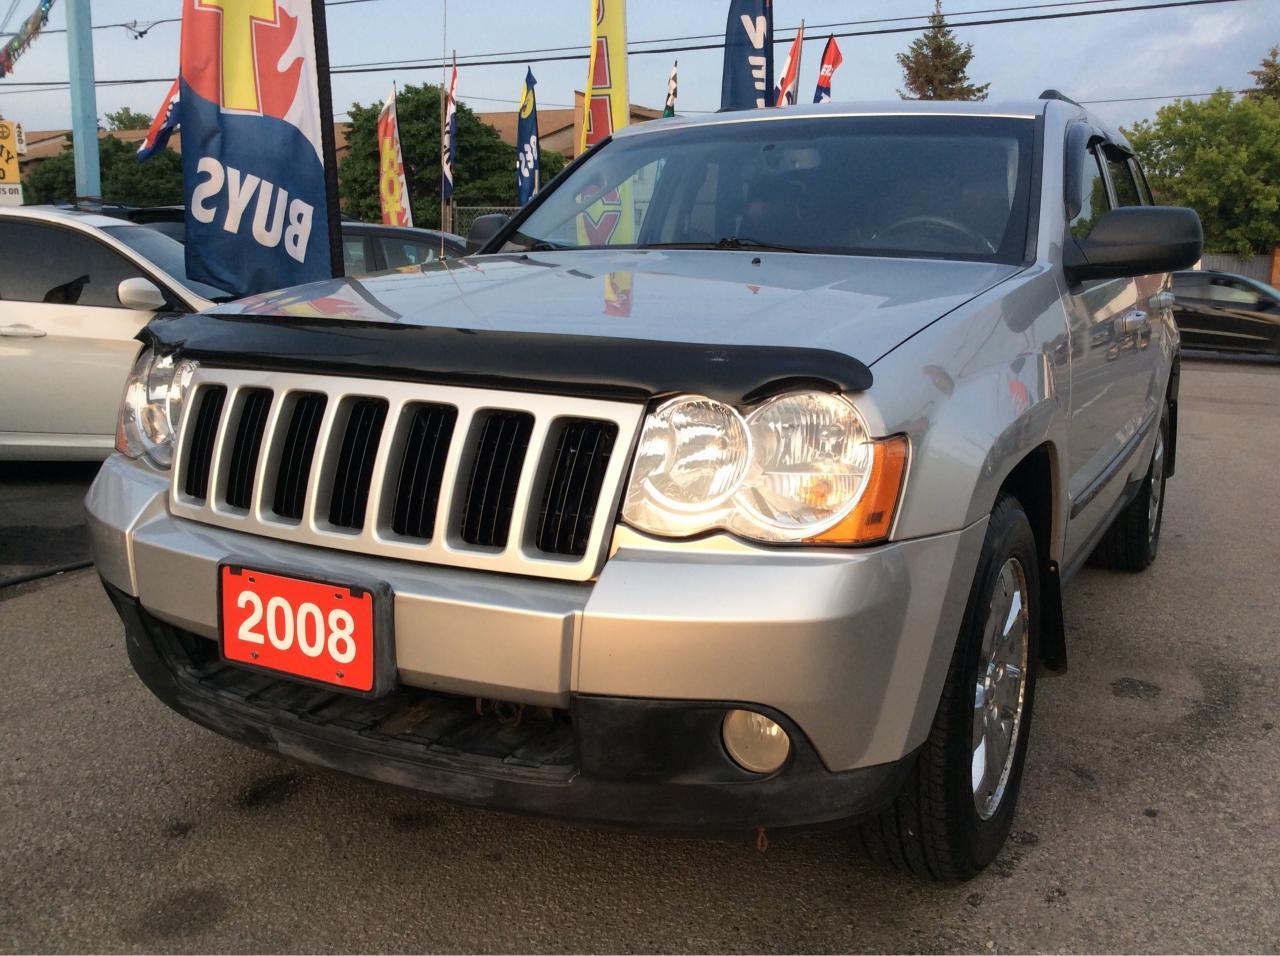 2008 Jeep Grand Cherokee Diesel/3.0L/Low Mileage/Laredo/4X4/Roof/Alloys